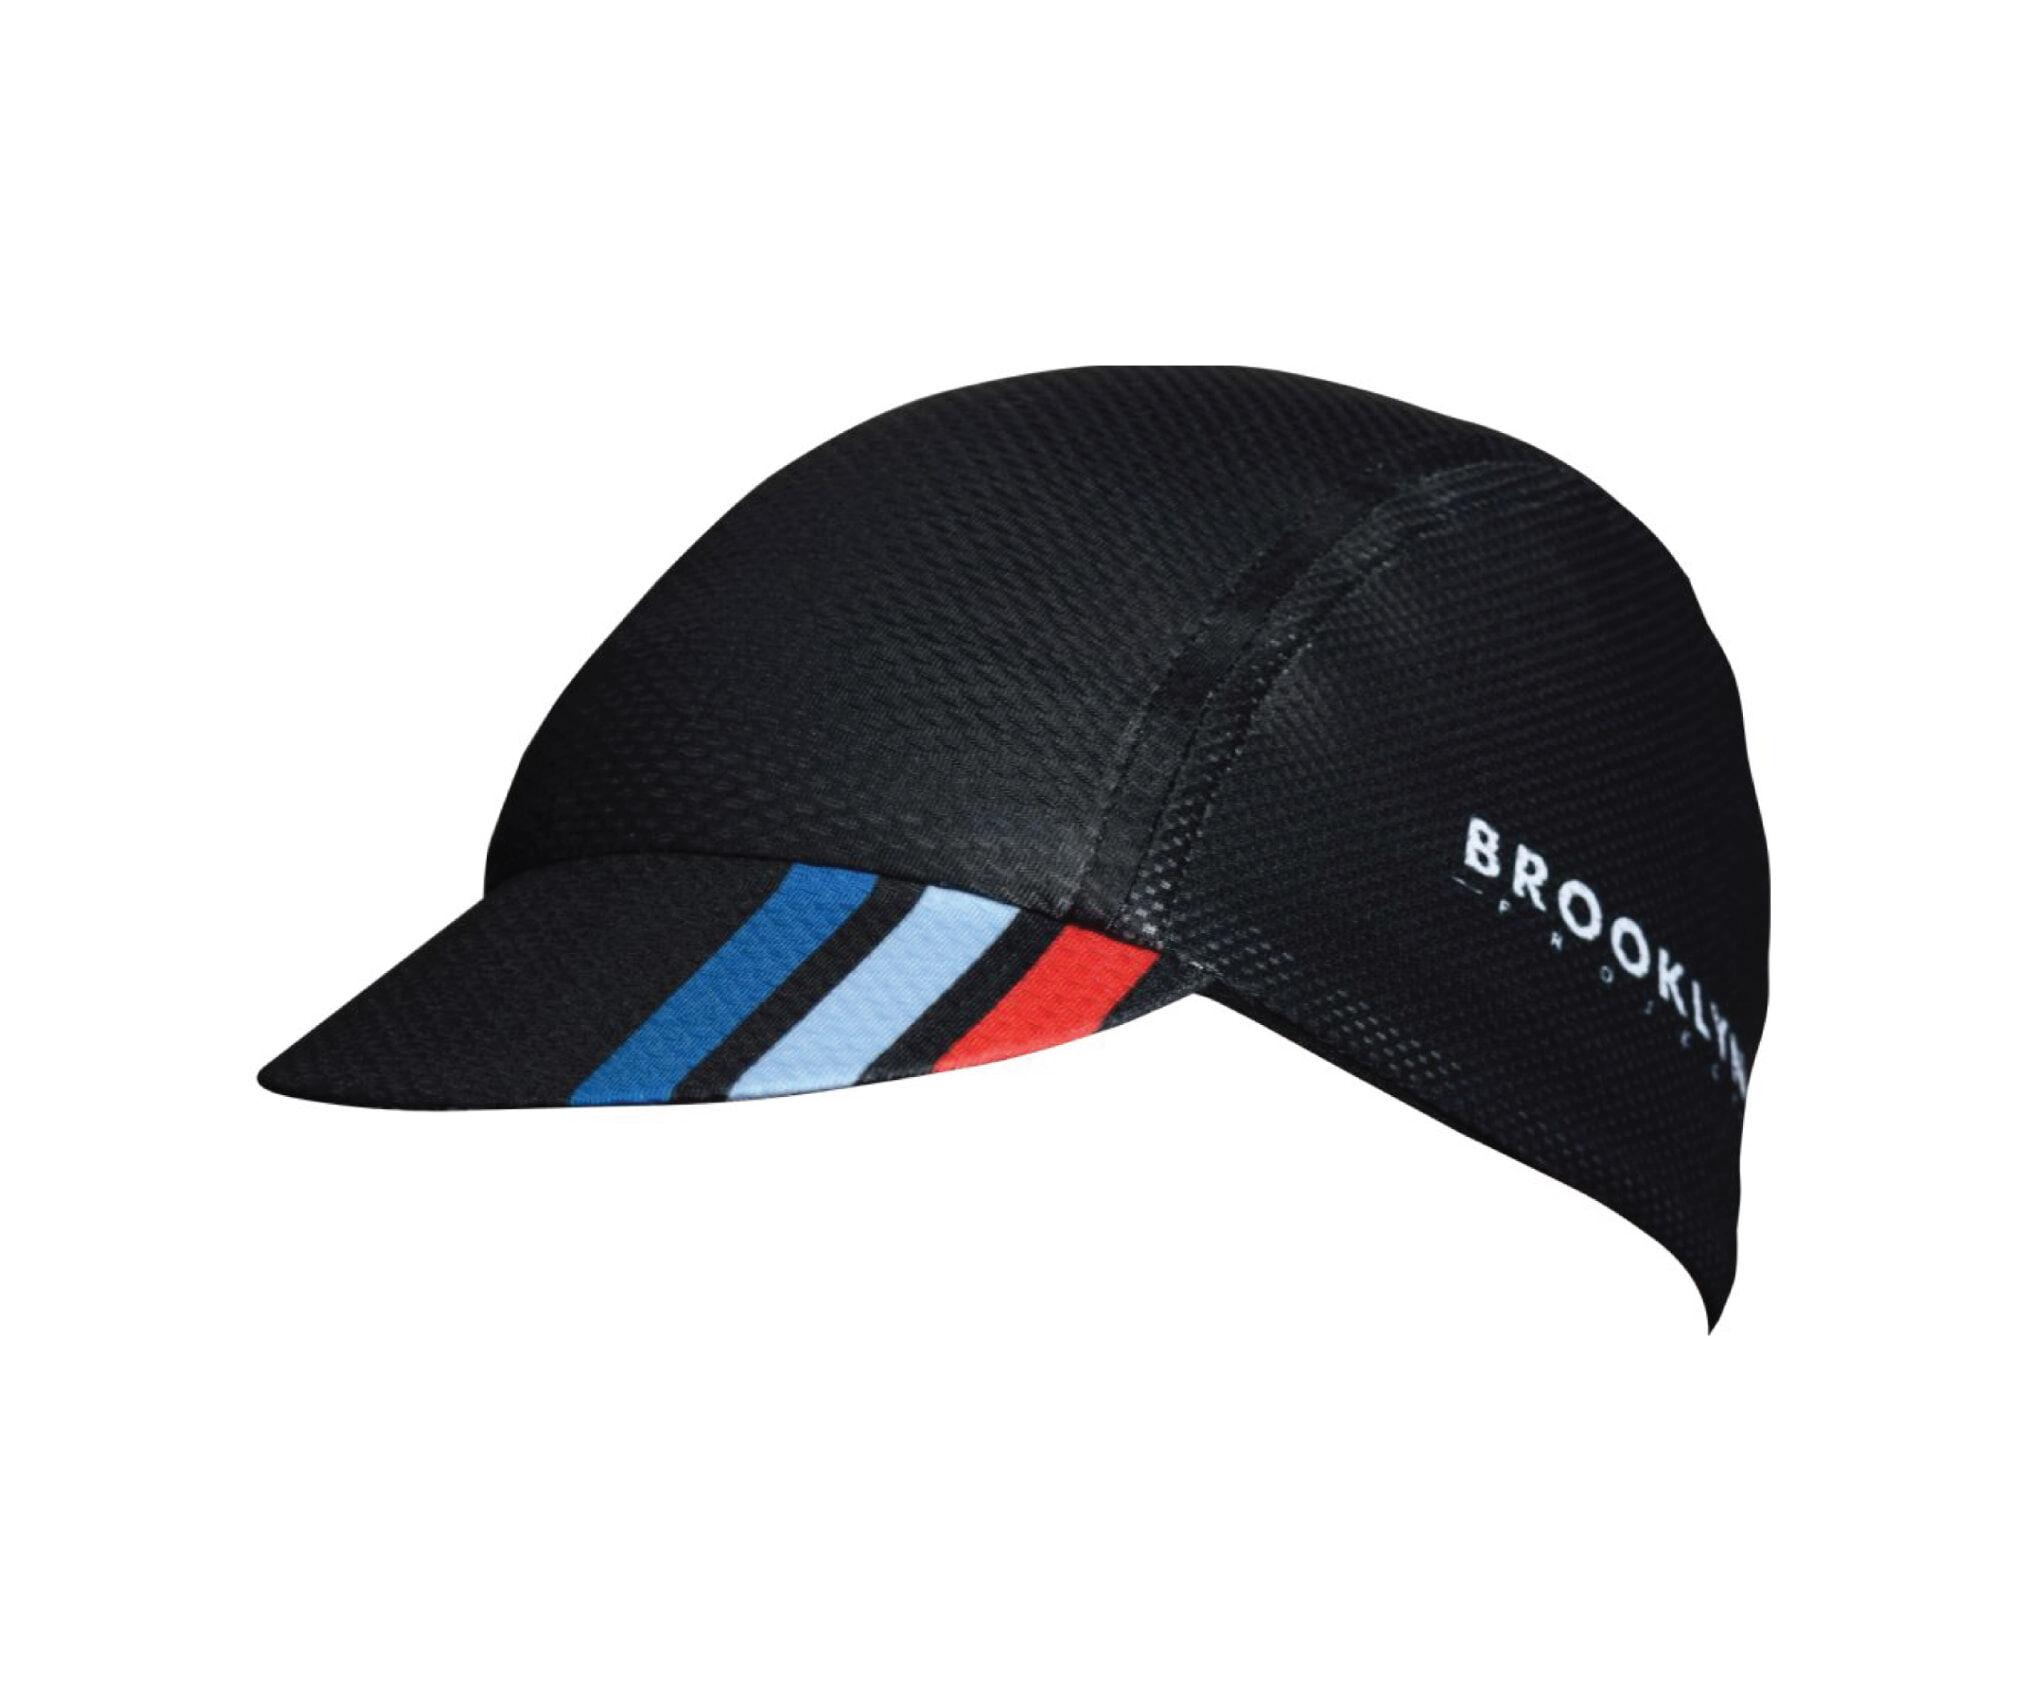 Cycling-Cap-2